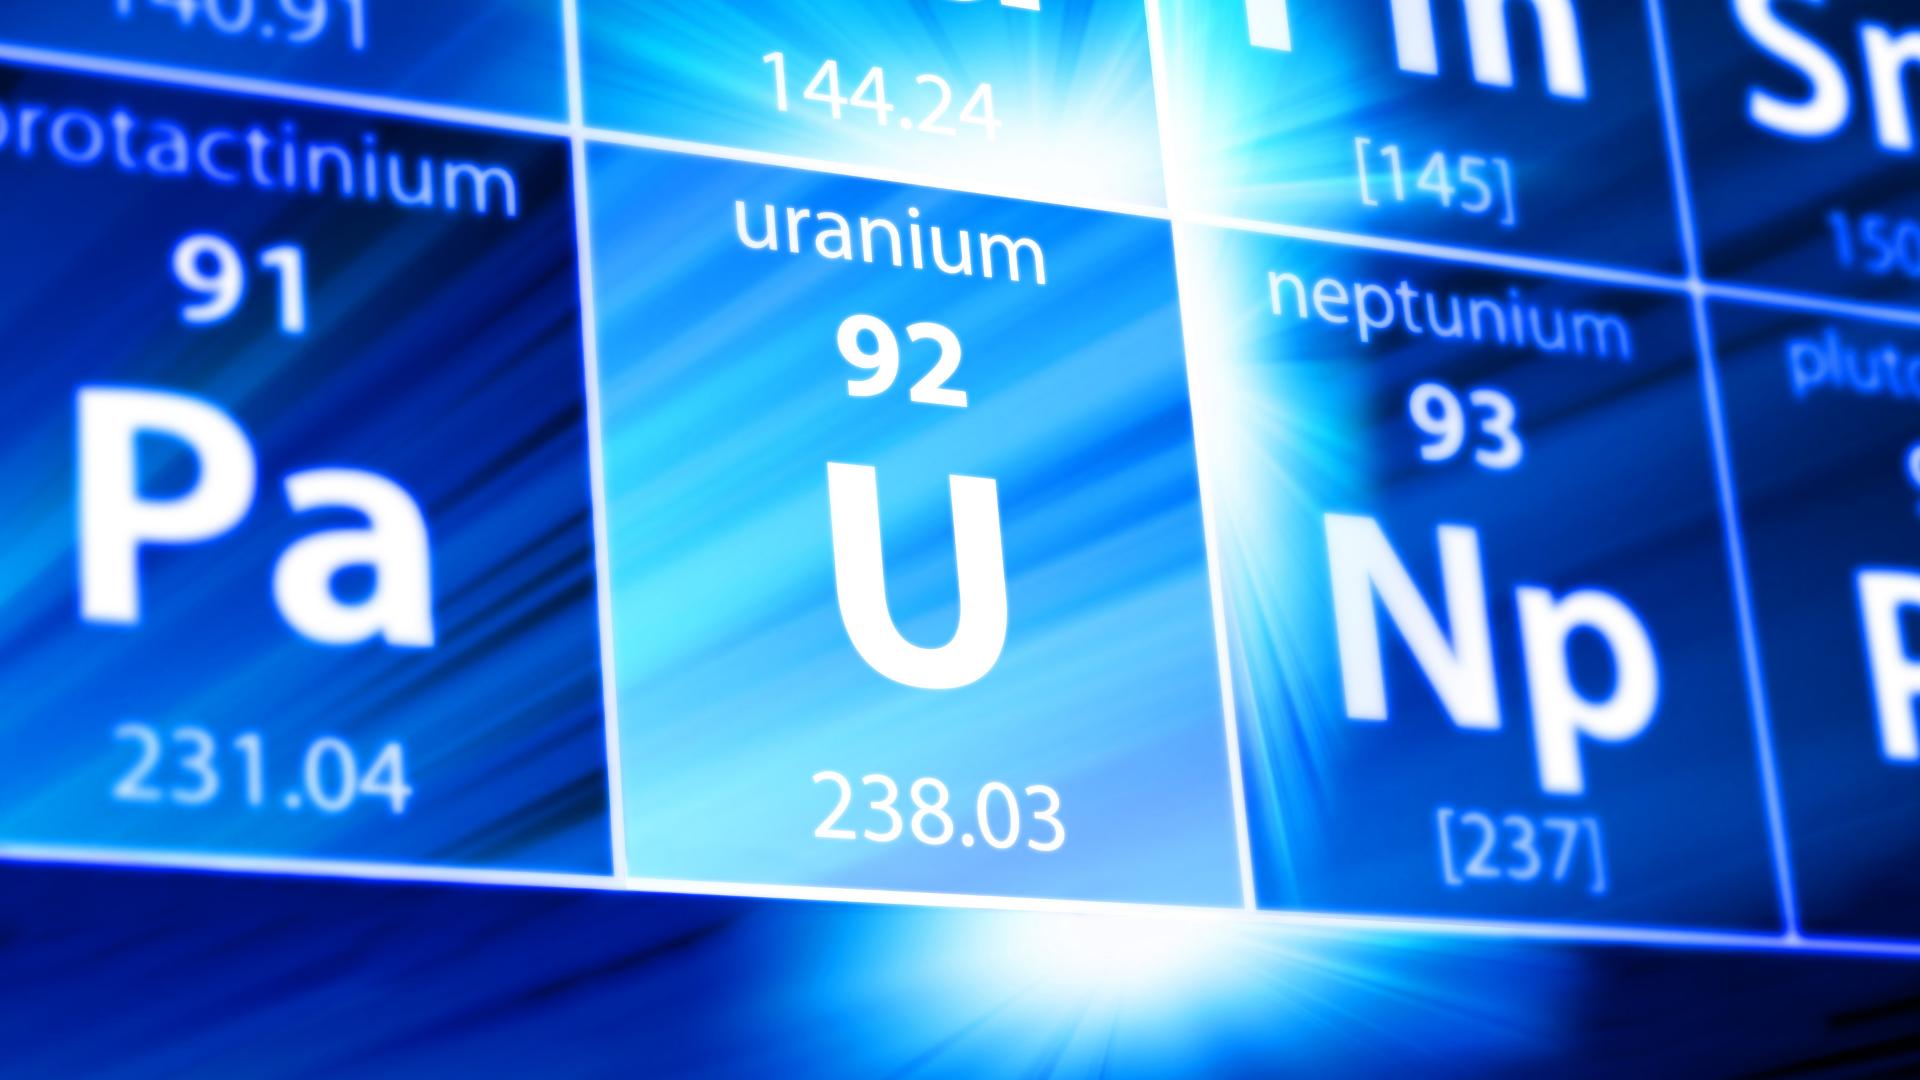 Uranium ETF. Alternate energy source